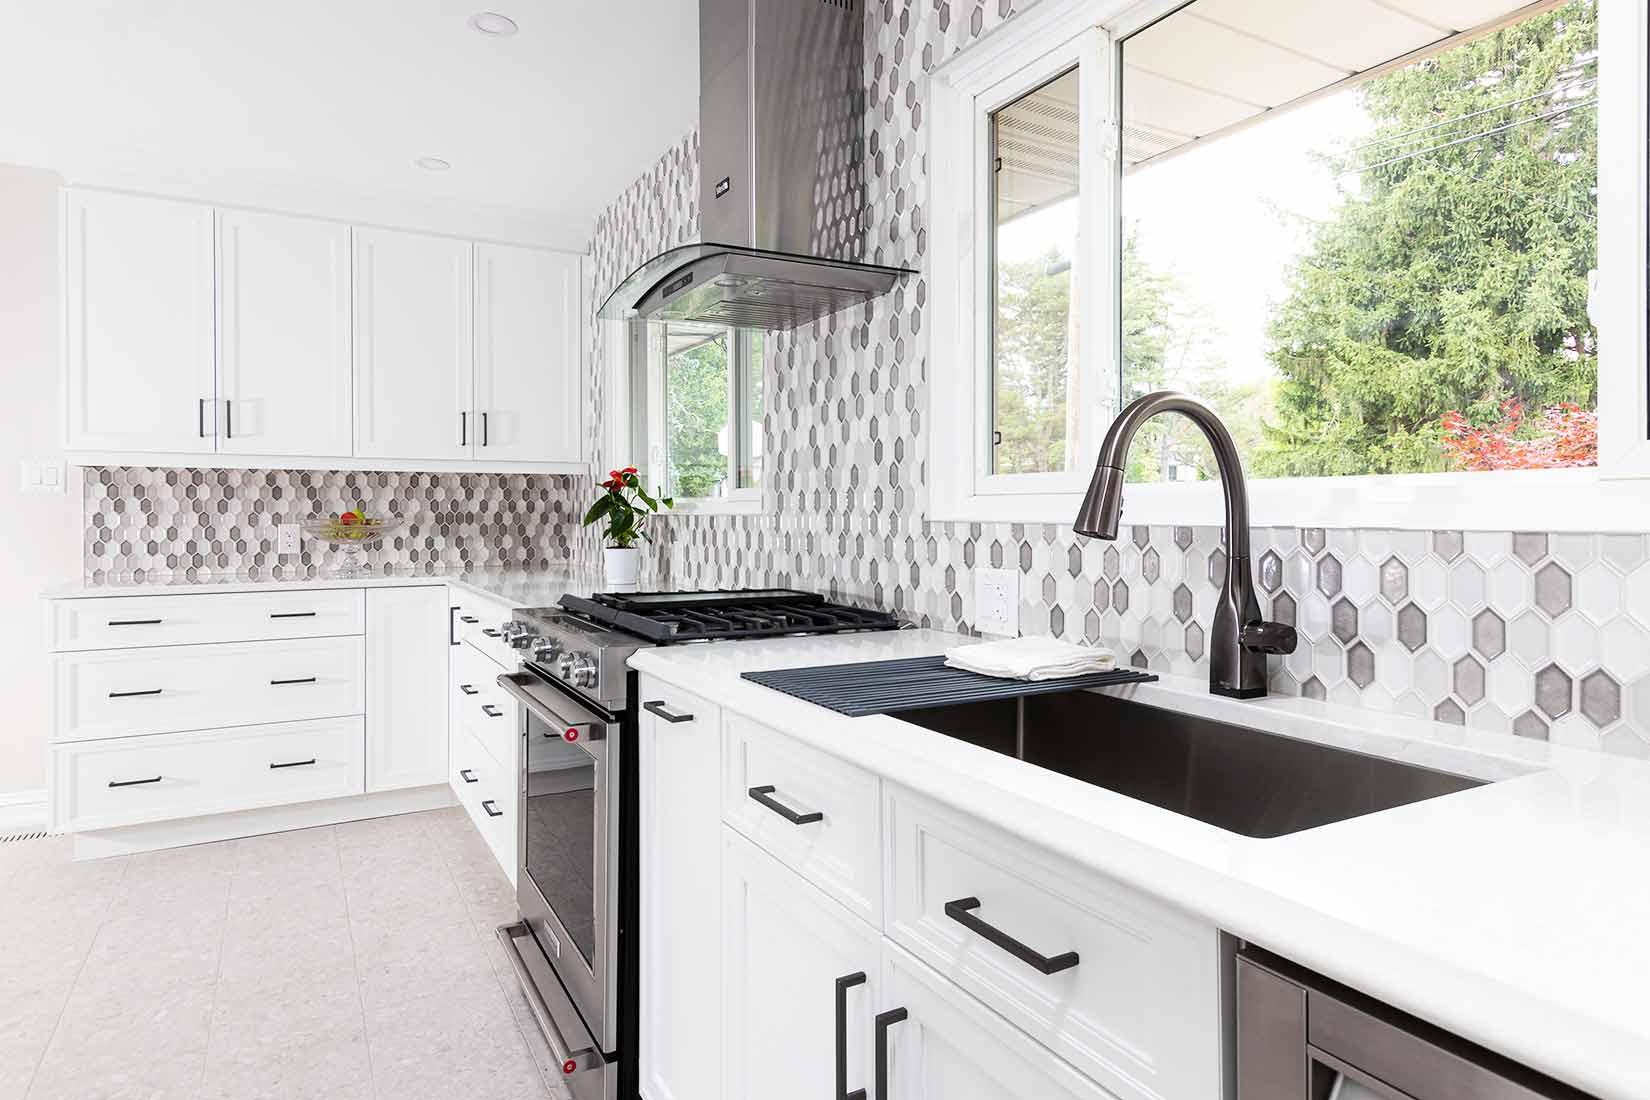 kitchen cabinets designs Hamilton Ontario azule kitchens